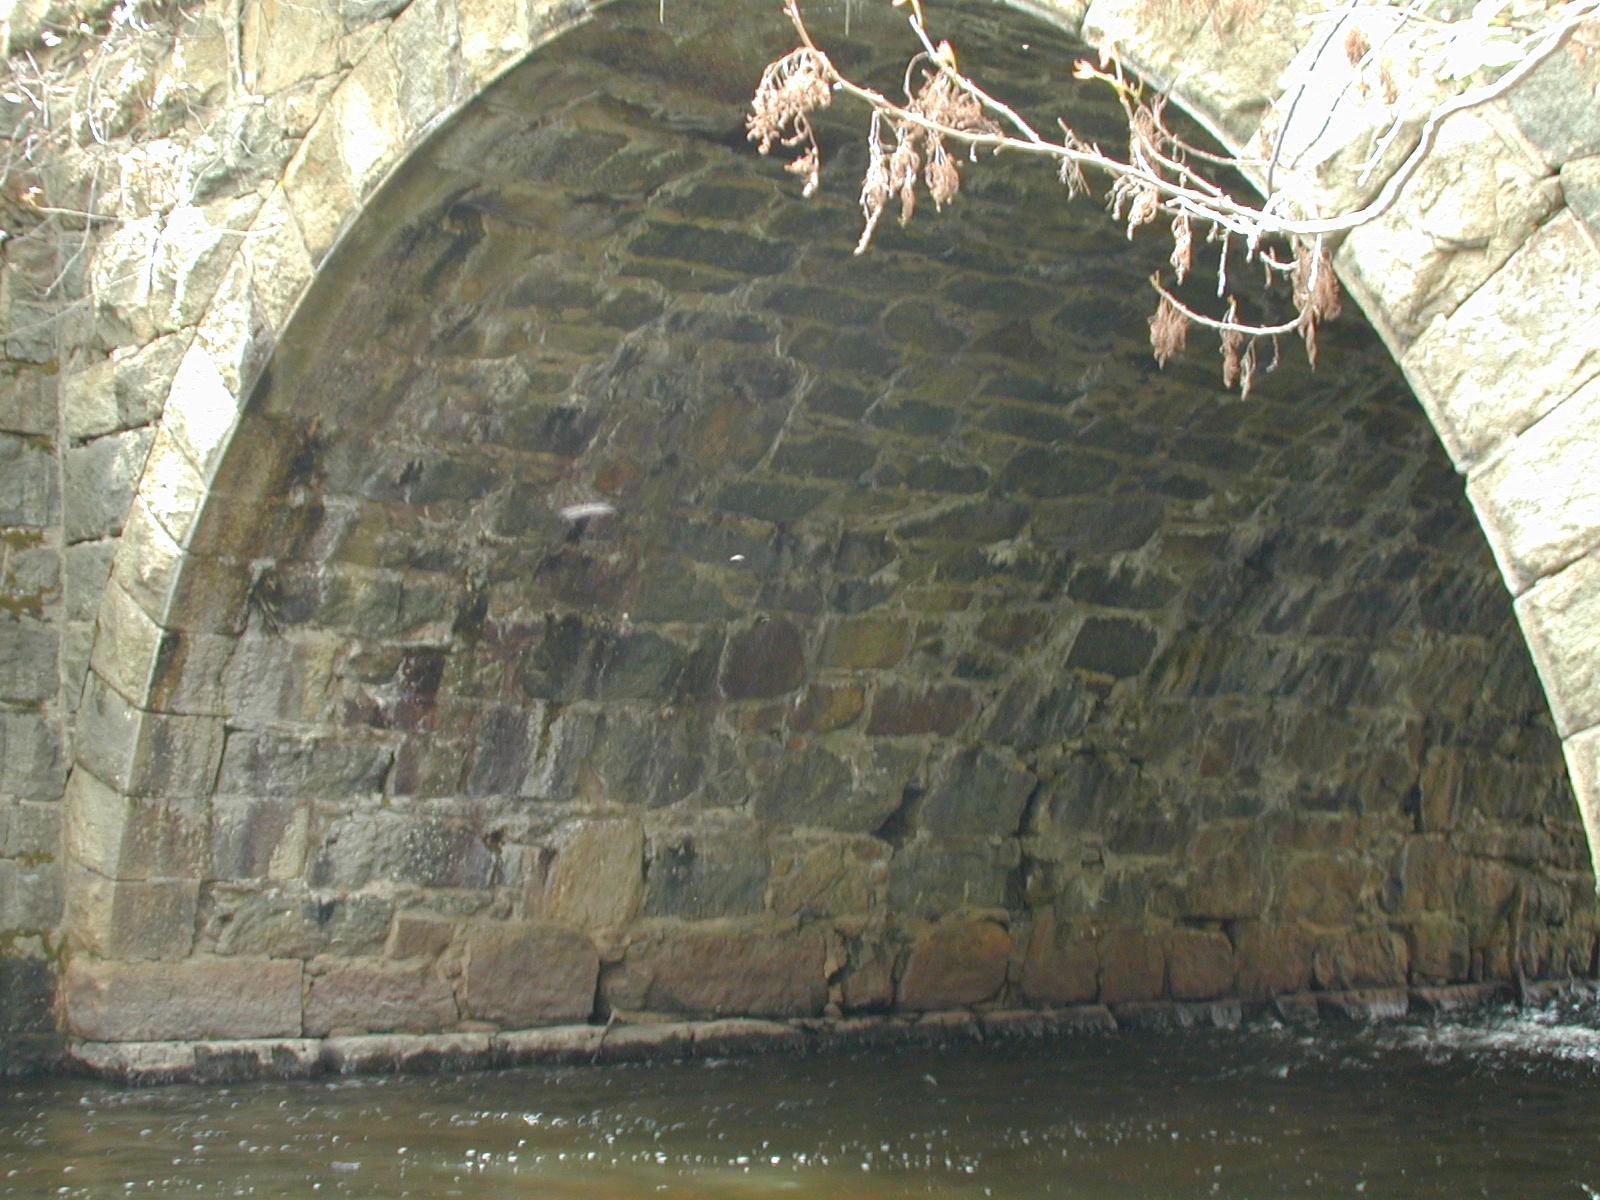 Lamington Viaduct of the CRNJ